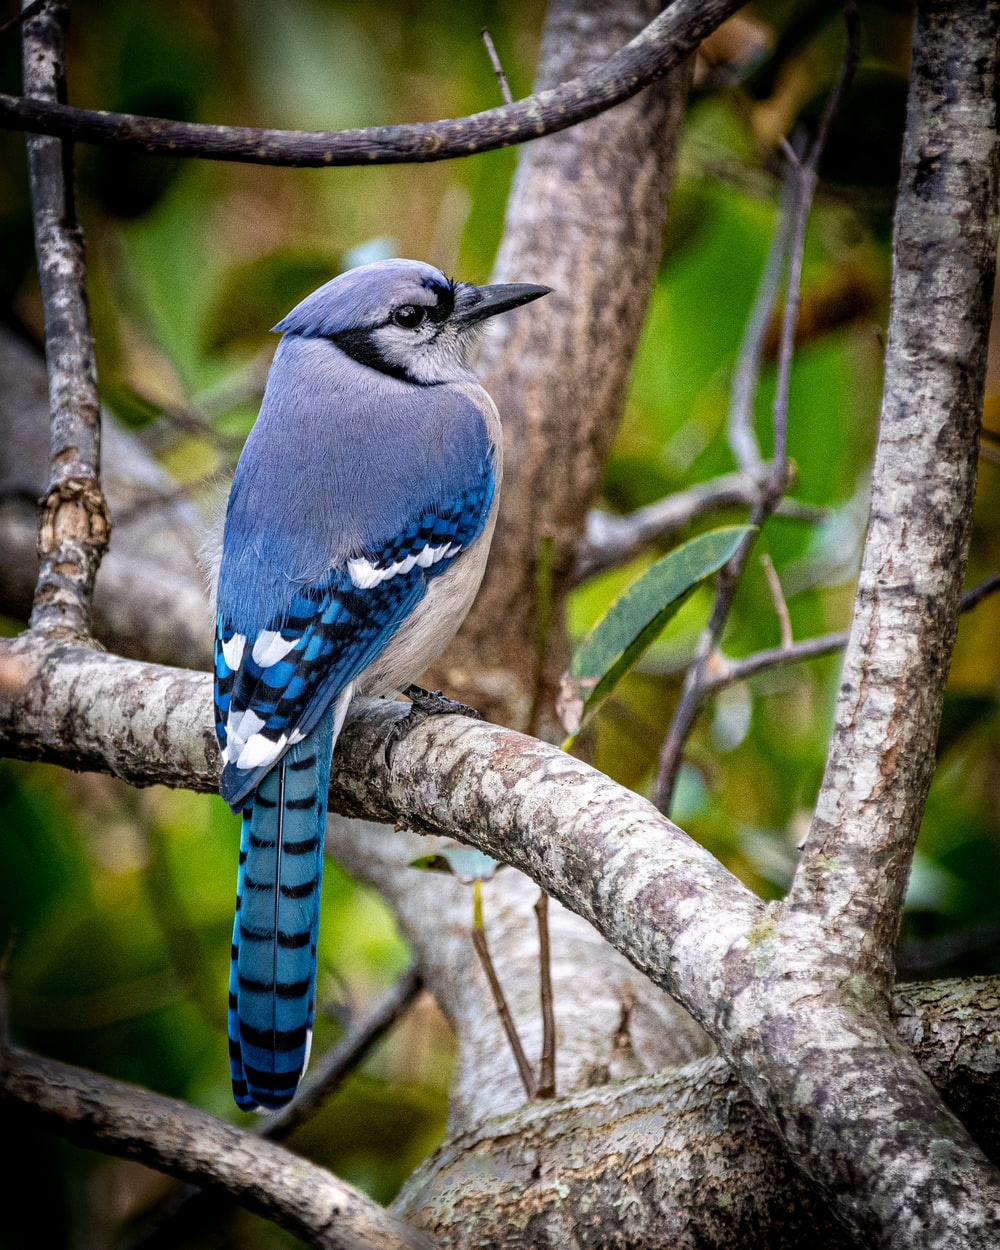 gray bird on branch during daytime